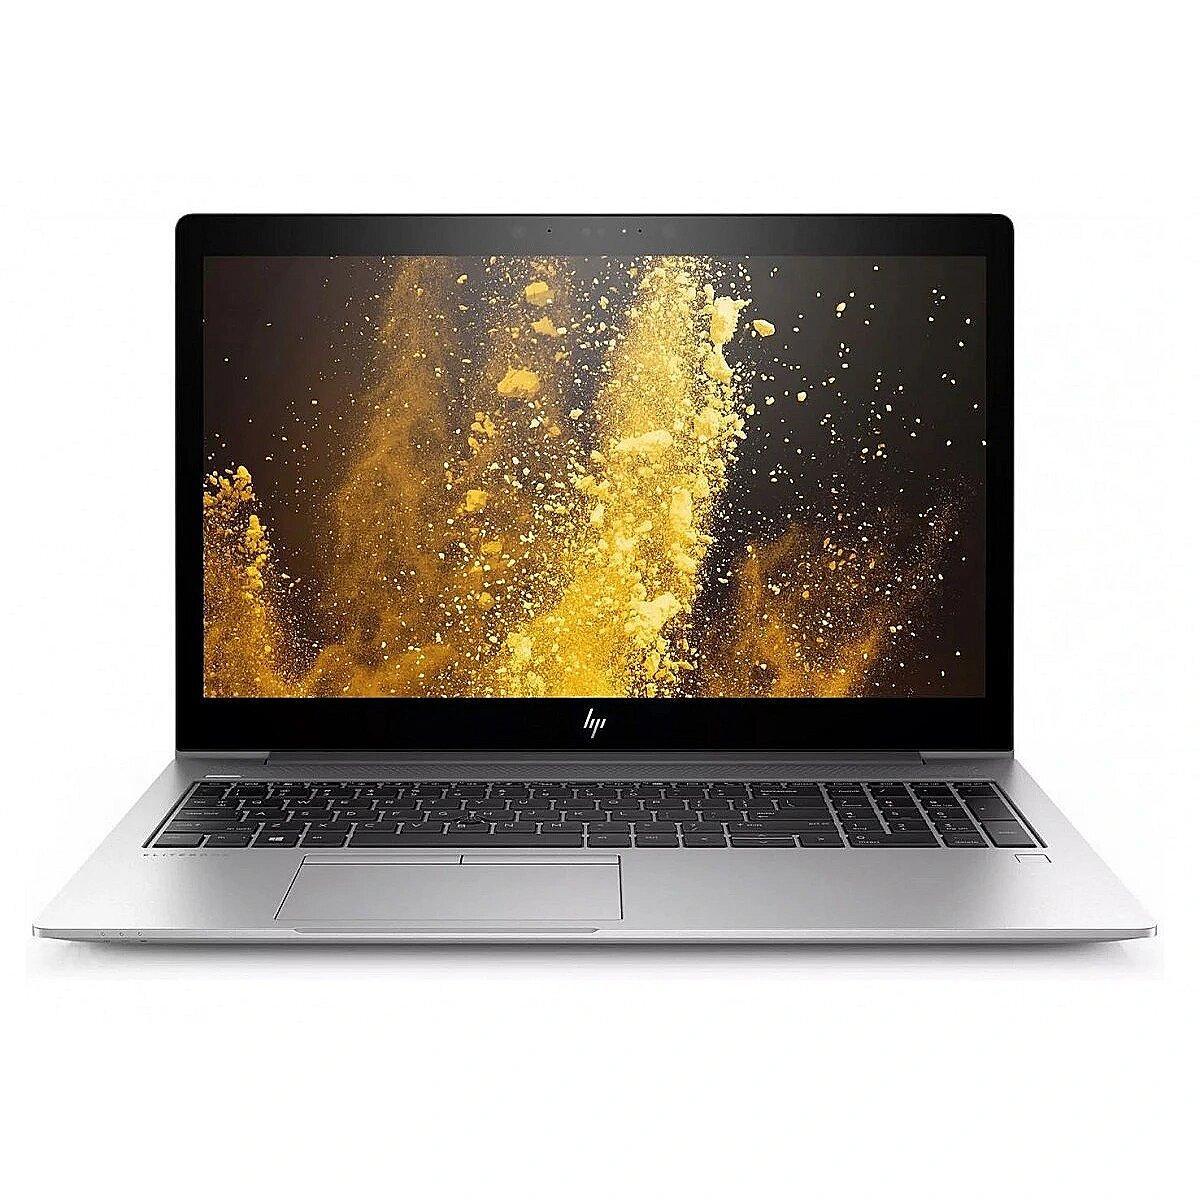 Hewlett Packard EliteBook 850 G6, 15.6